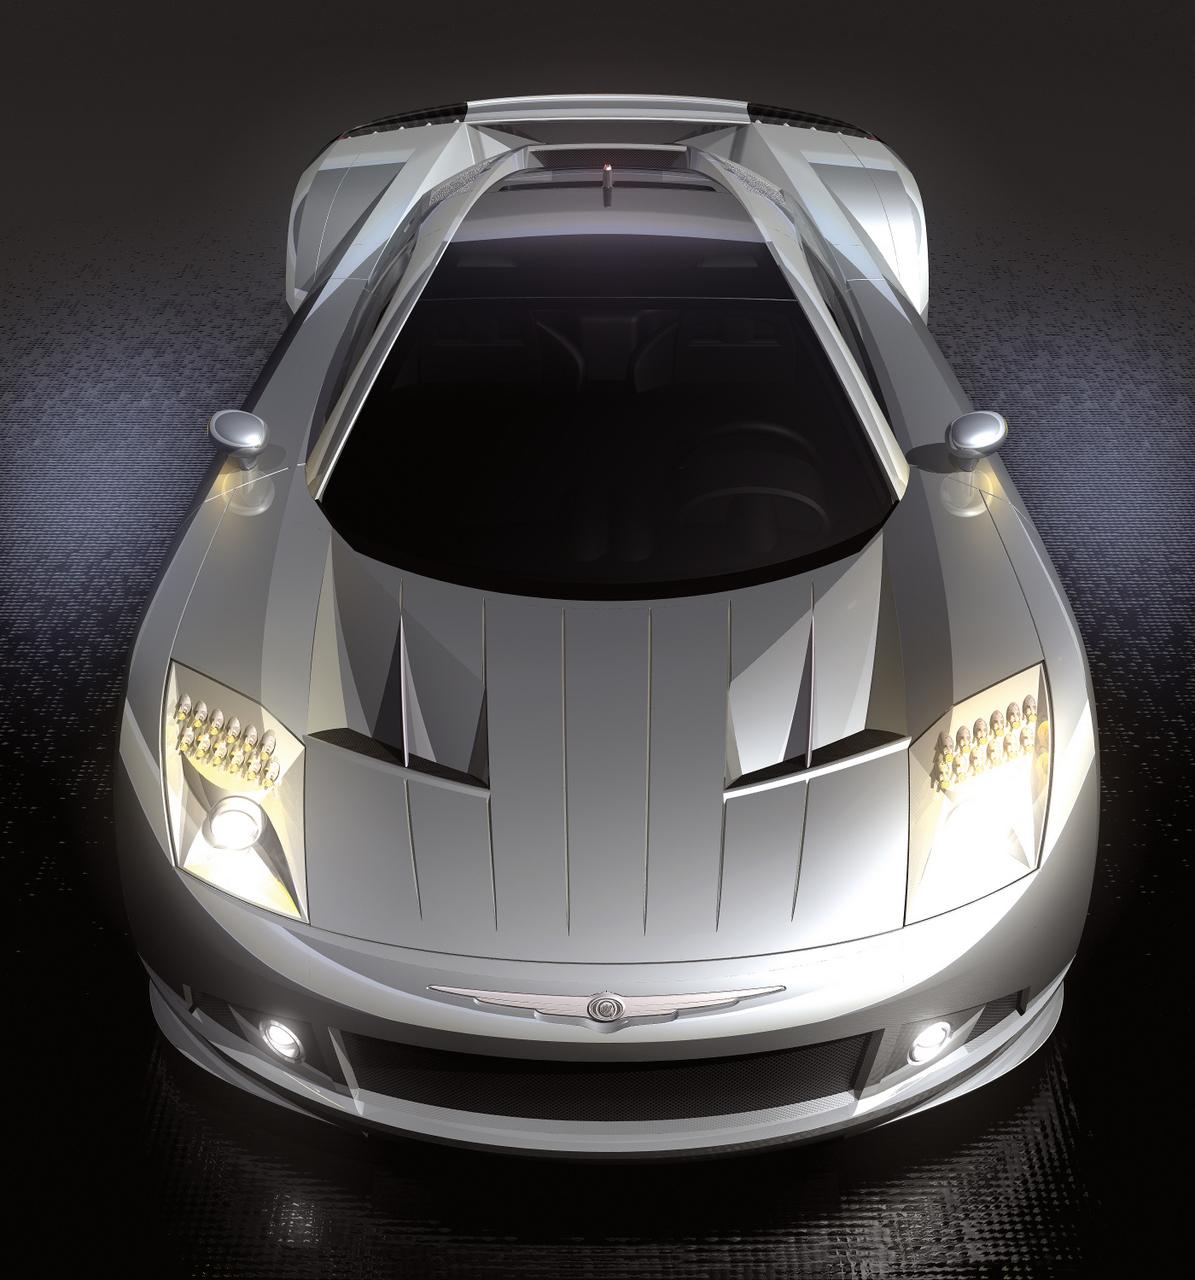 2004 Chrysler ME Four-Twelve - Concepts